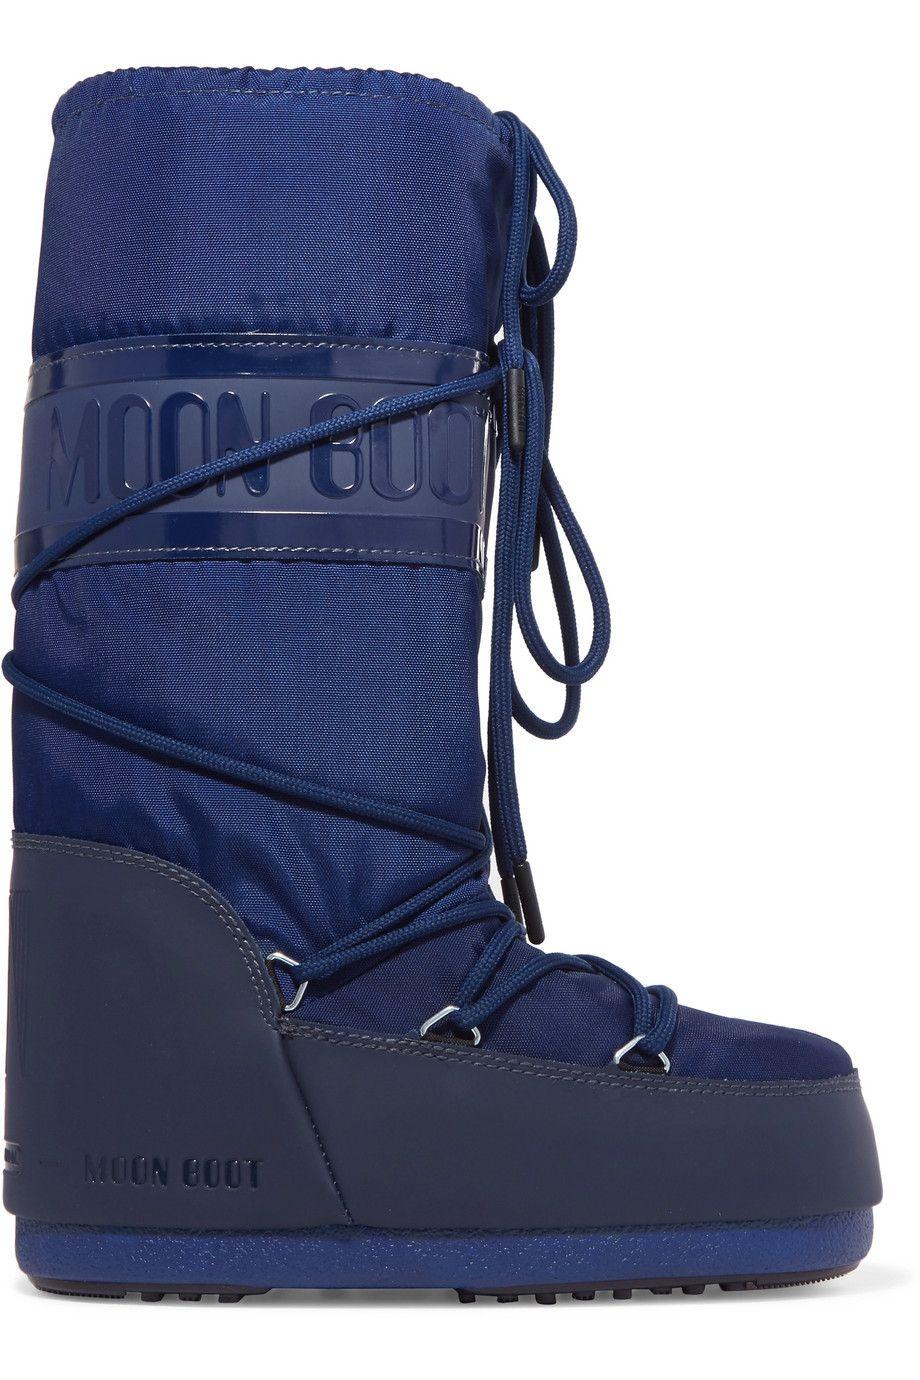 look da sci come I moon boots